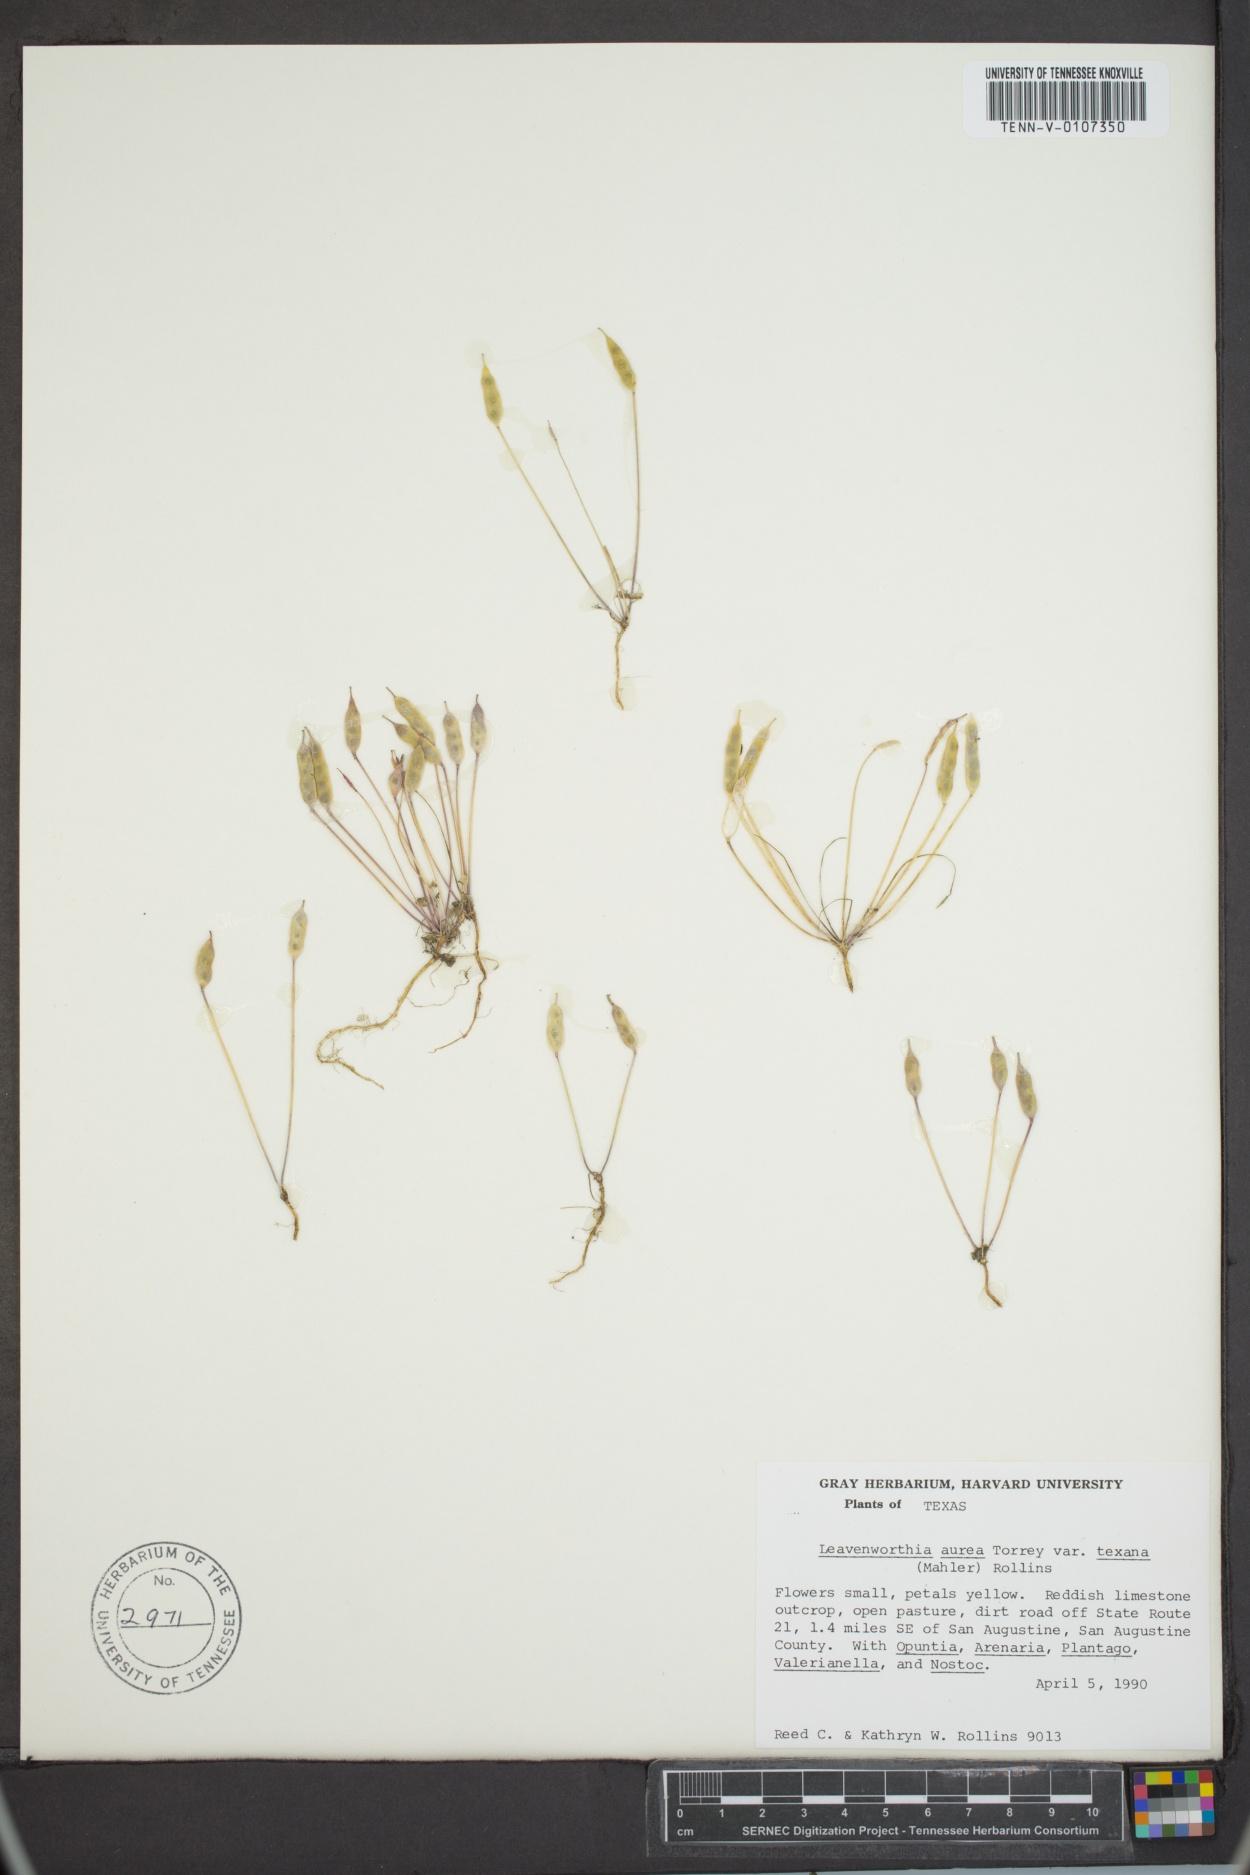 Leavenworthia aurea var. texana image